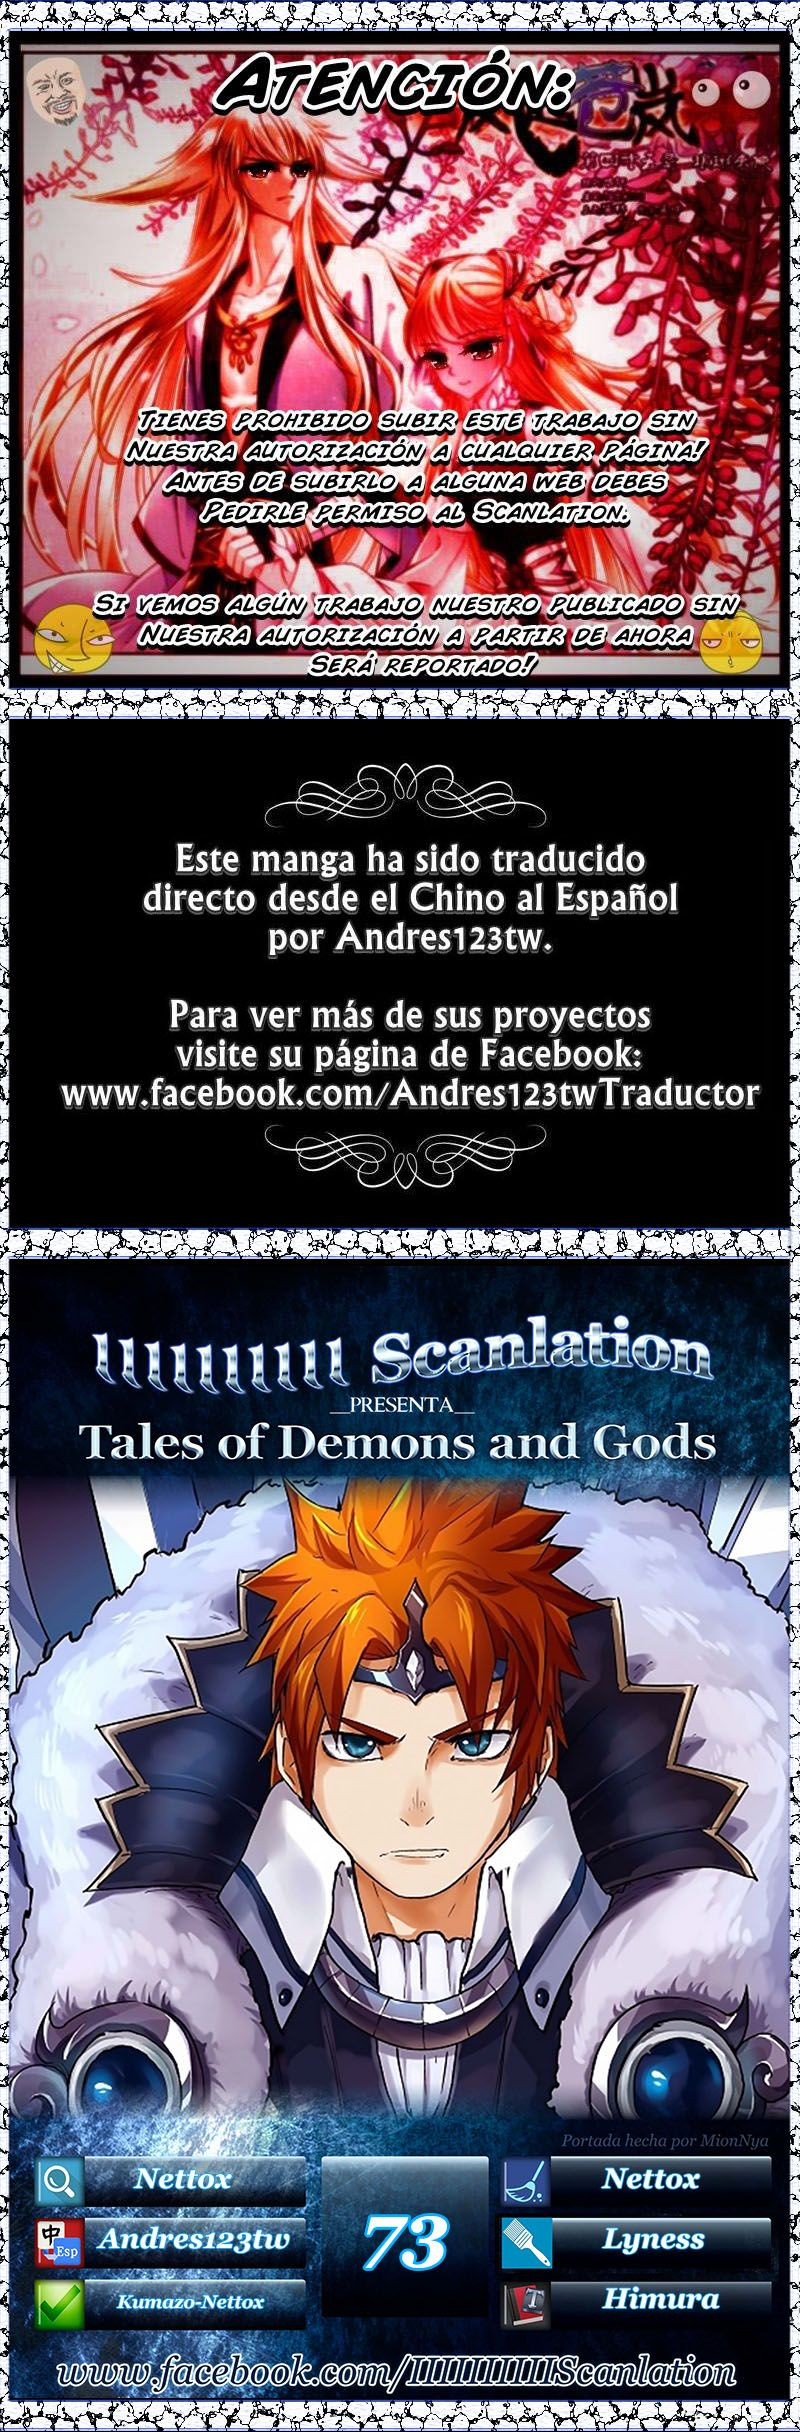 http://c5.ninemanga.com/es_manga/7/17735/457030/e5fa8a713417afe3c4fd2b9ddfb2d734.jpg Page 1